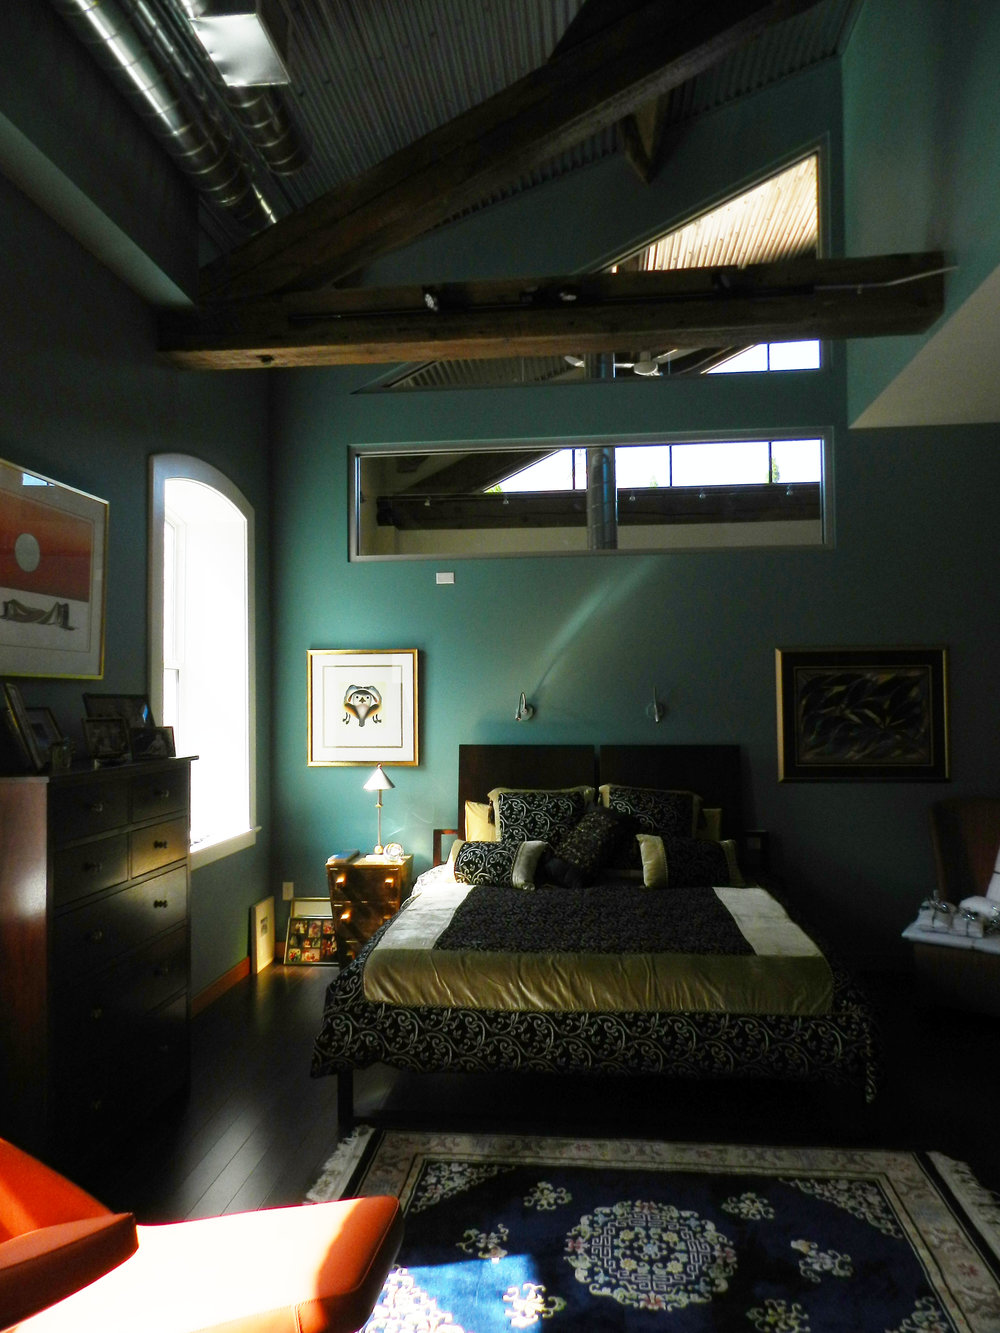 Erla-Bedroom.jpg